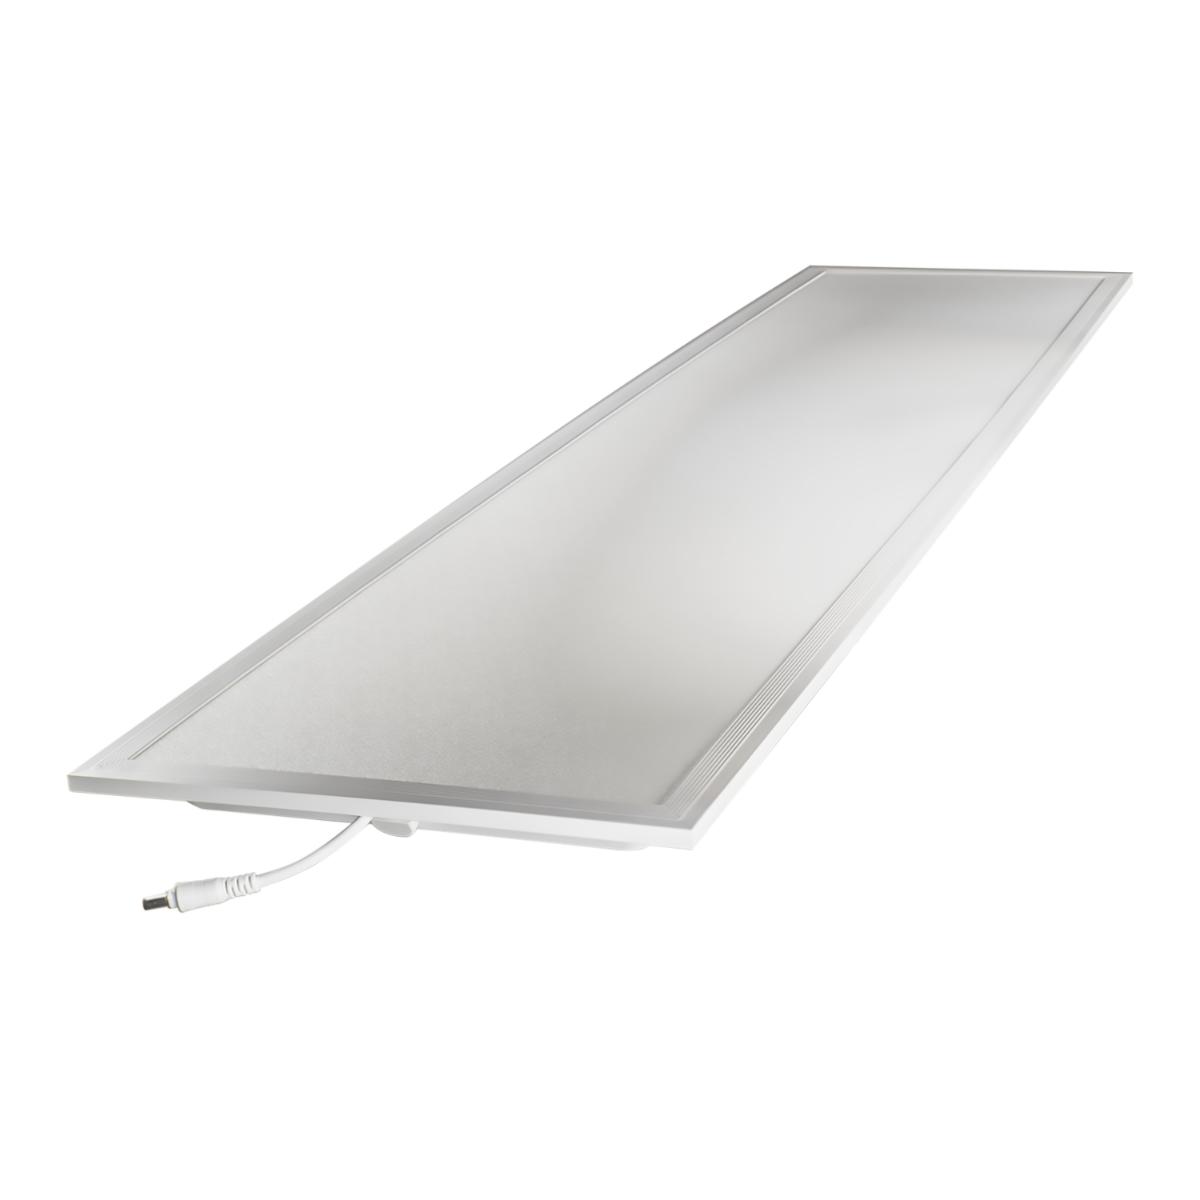 Noxion Panel LED Delta Pro Highlum V2.0 Xitanium DALI 40W 30x120cm 4000K 5480lm UGR <19 | Dali Regulable - Blanco Frio - Reemplazo 2x36W